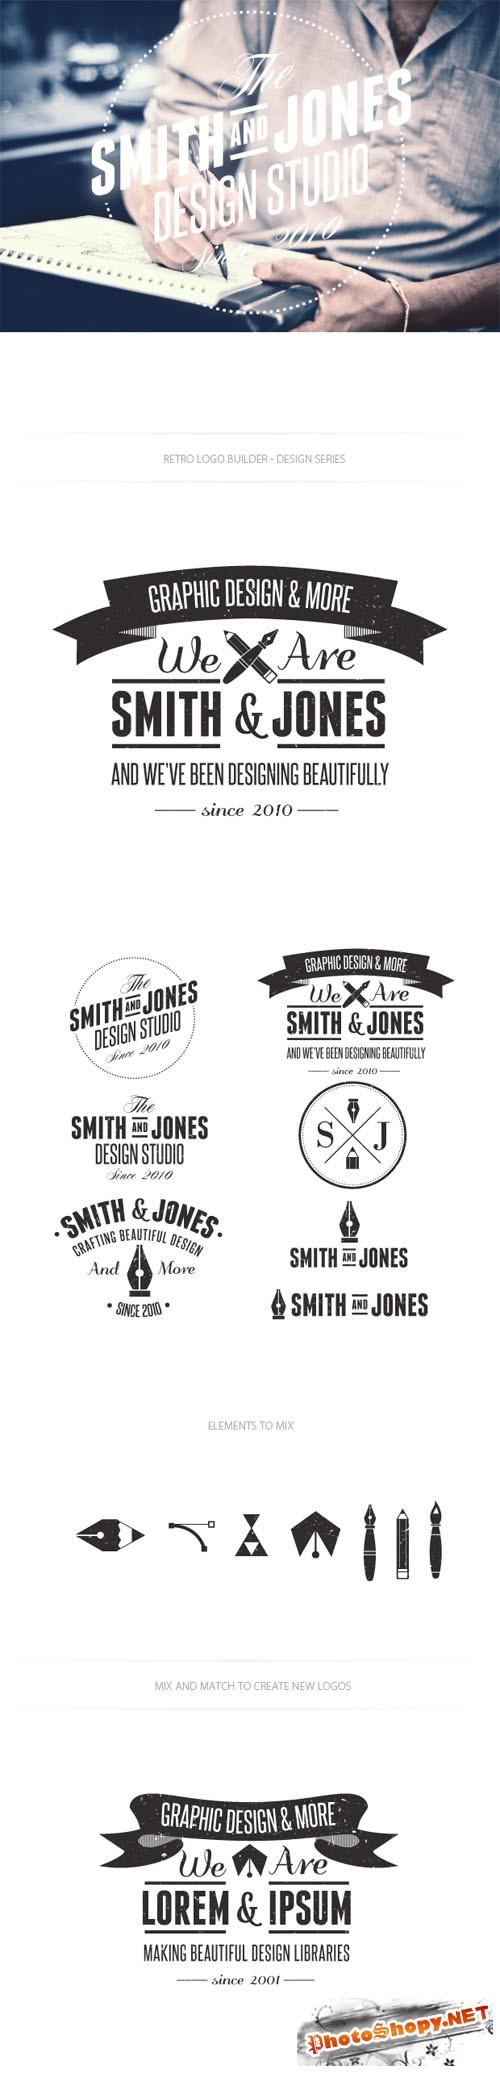 Design Studio Logo Vector Templates